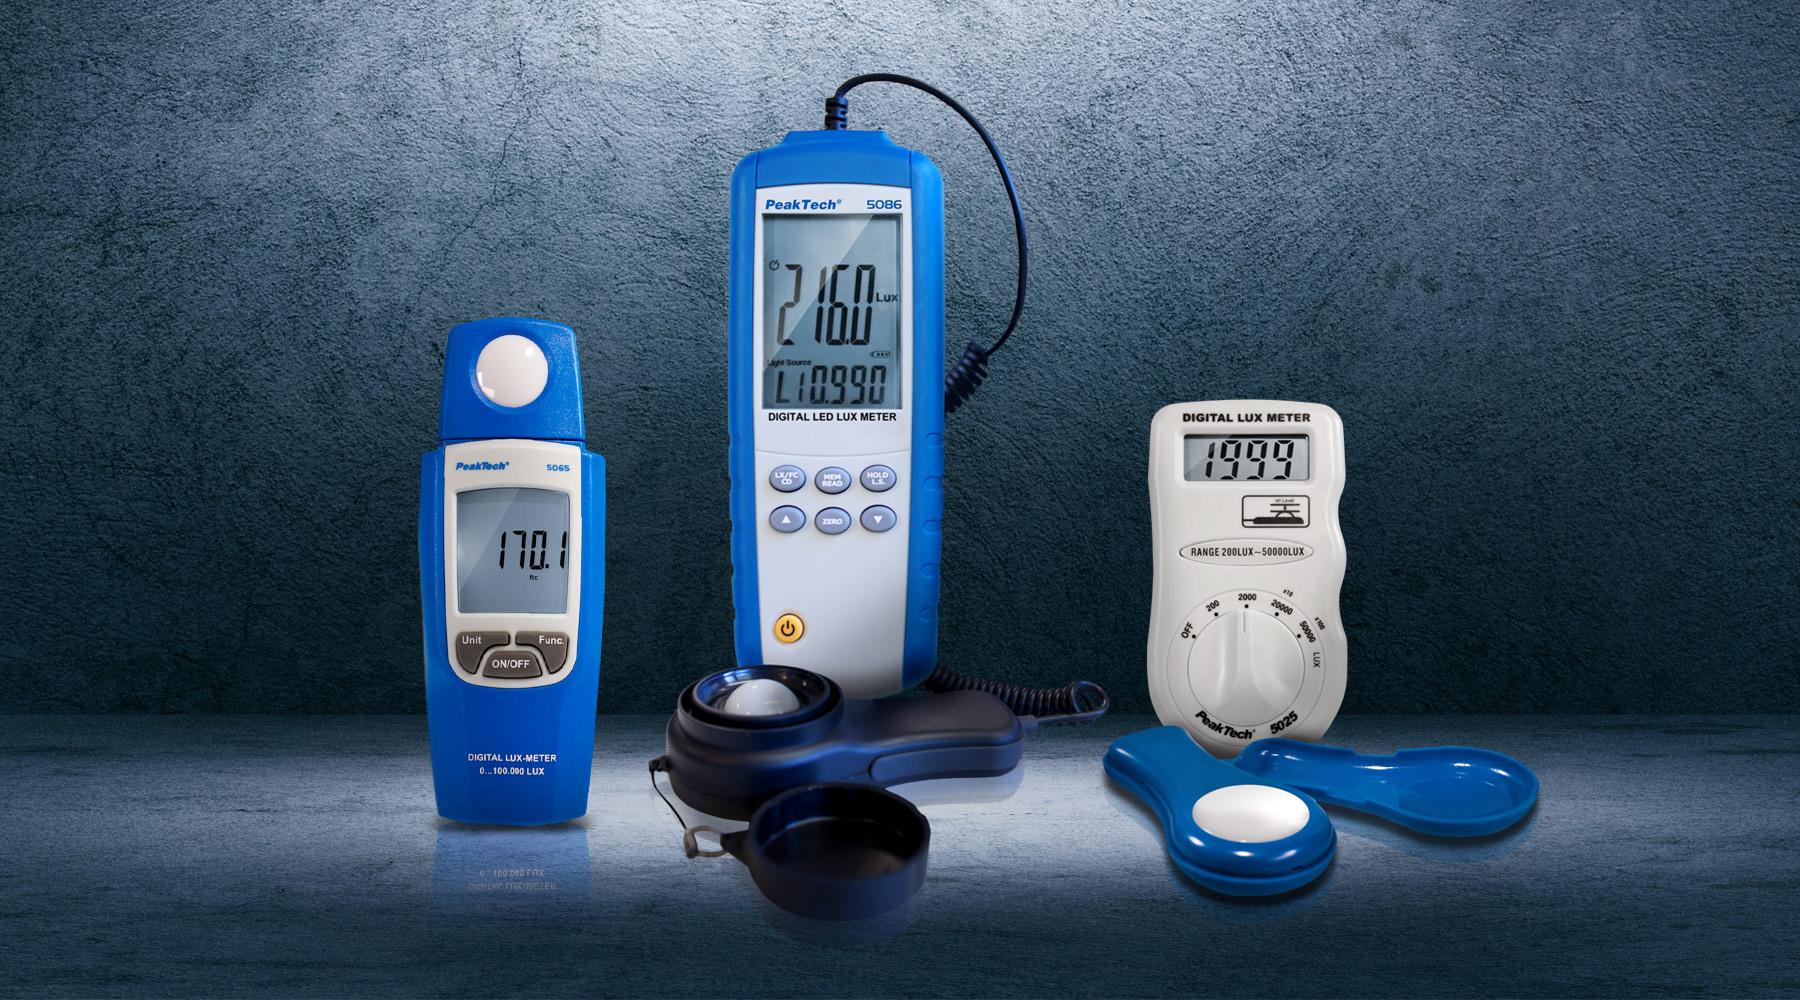 Lux  / illumination meters